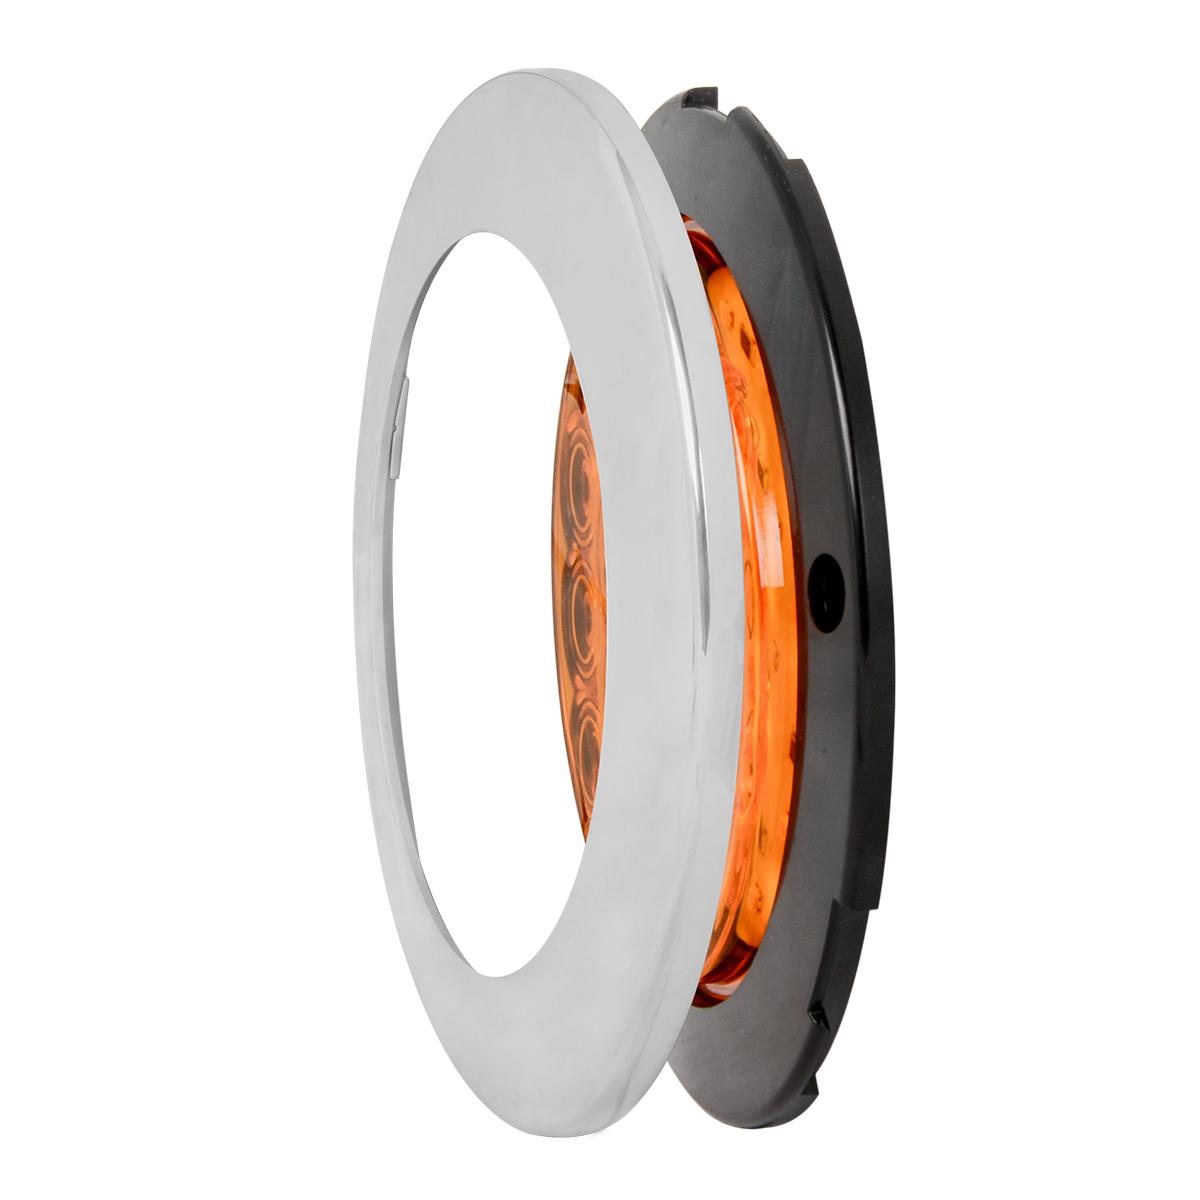 "75880 4"" Fleet Flange Mount LED Light with Chrome Twist & Lock Bezel in 3 Wires"